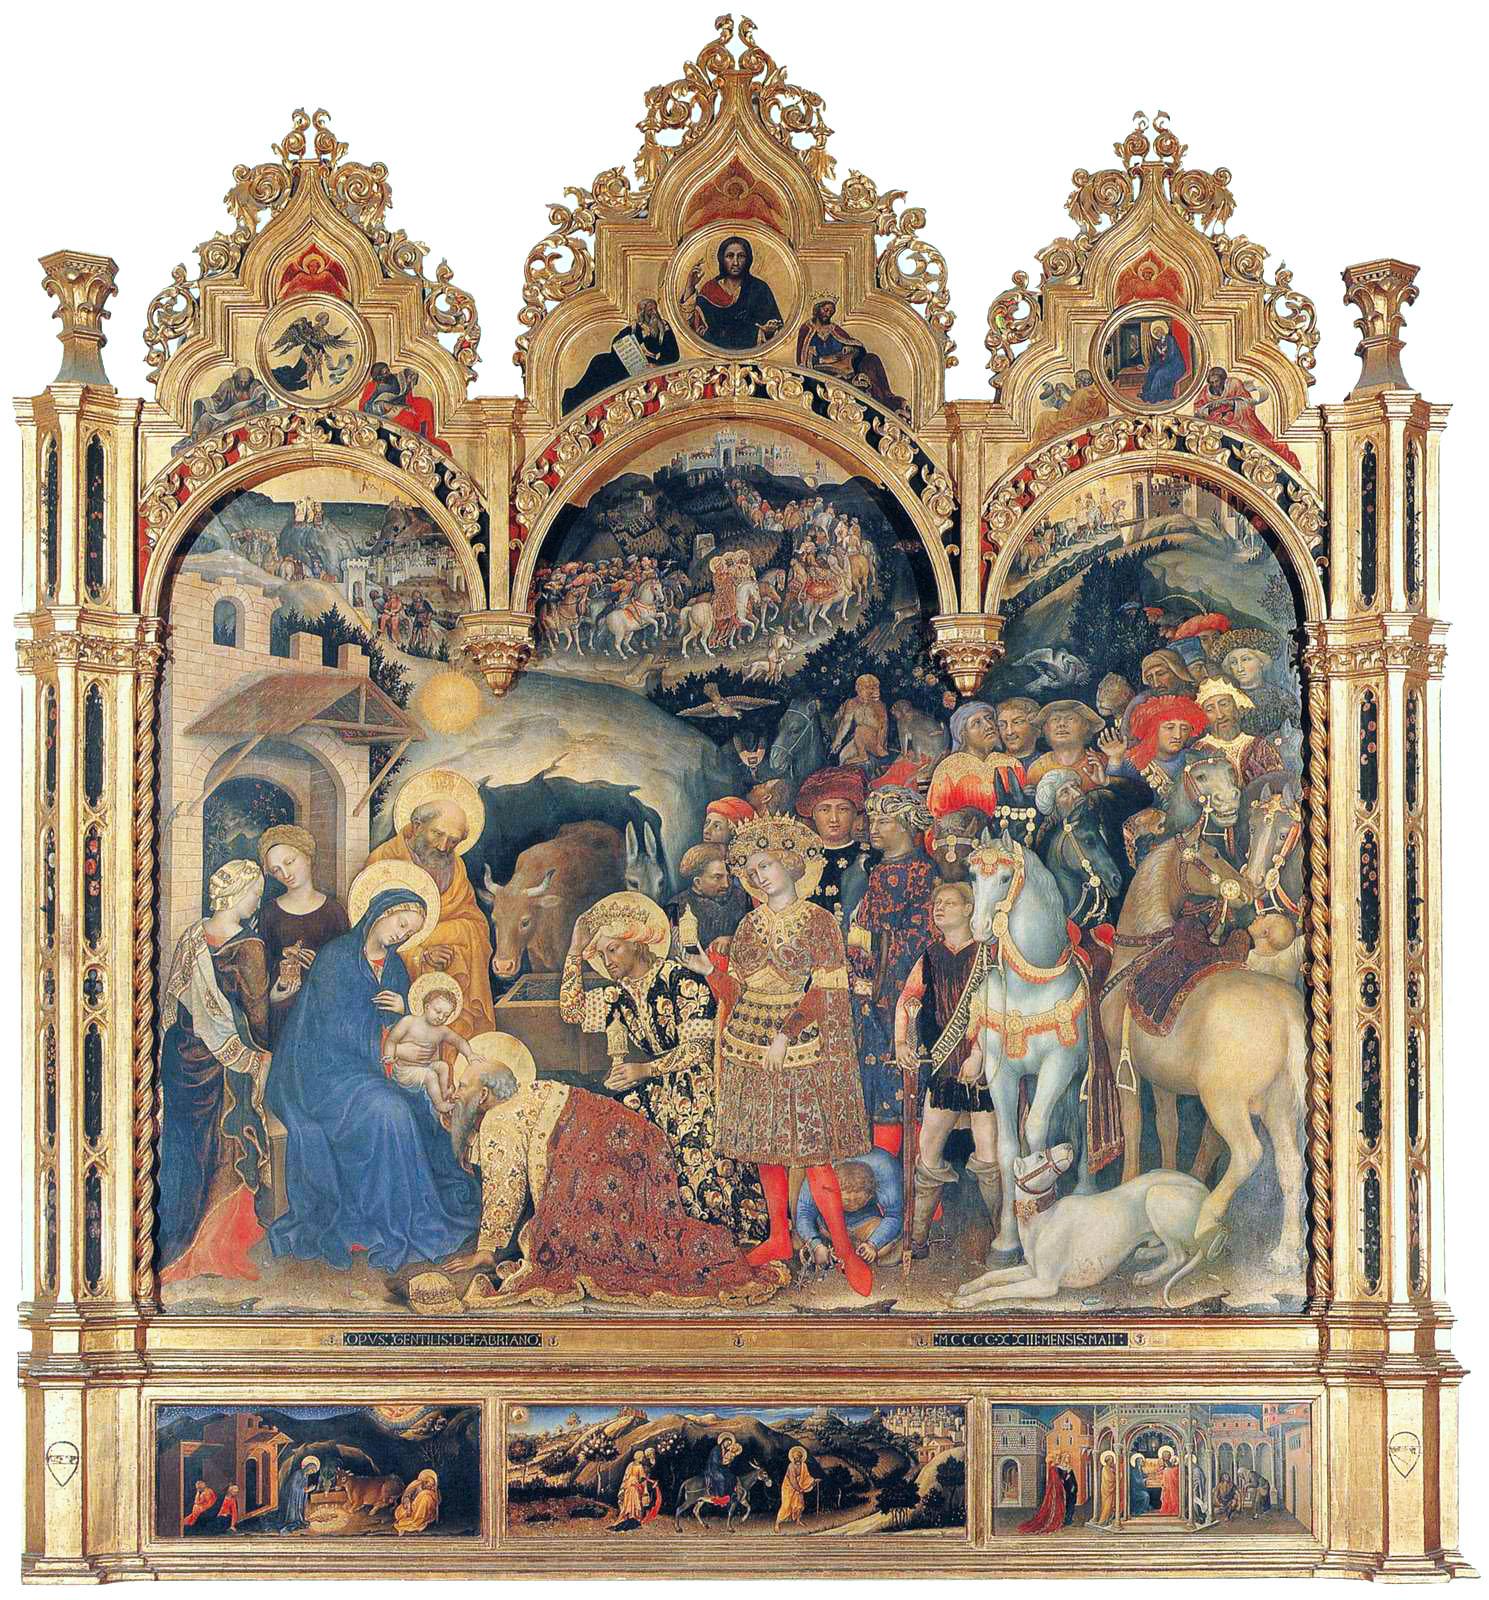 https://upload.wikimedia.org/wikipedia/commons/8/87/Gentile_da_Fabriano_001.jpg